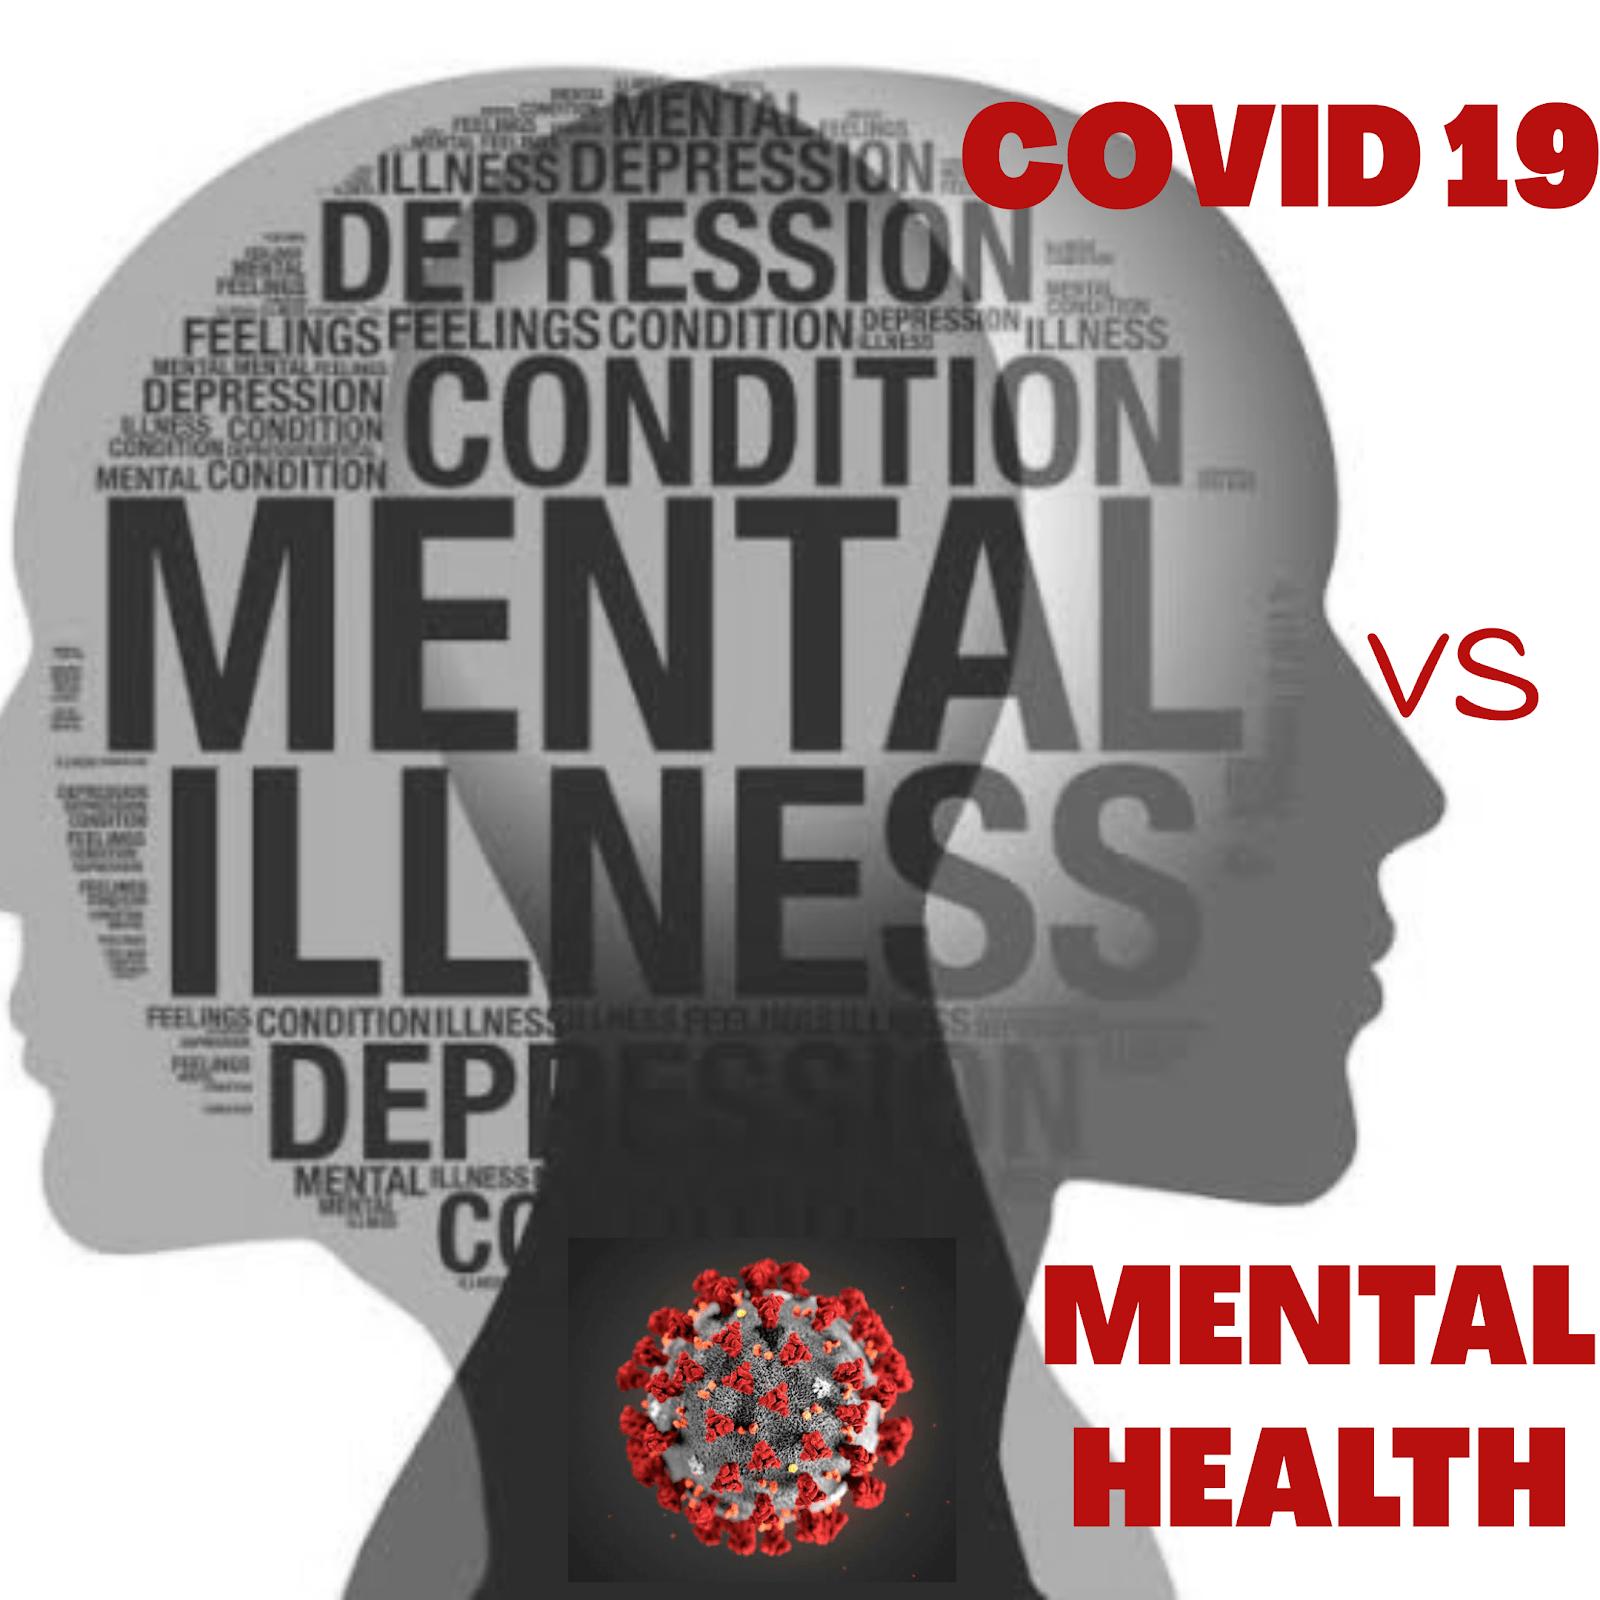 COVID 19 AFFECTING MENTAL HEALTH